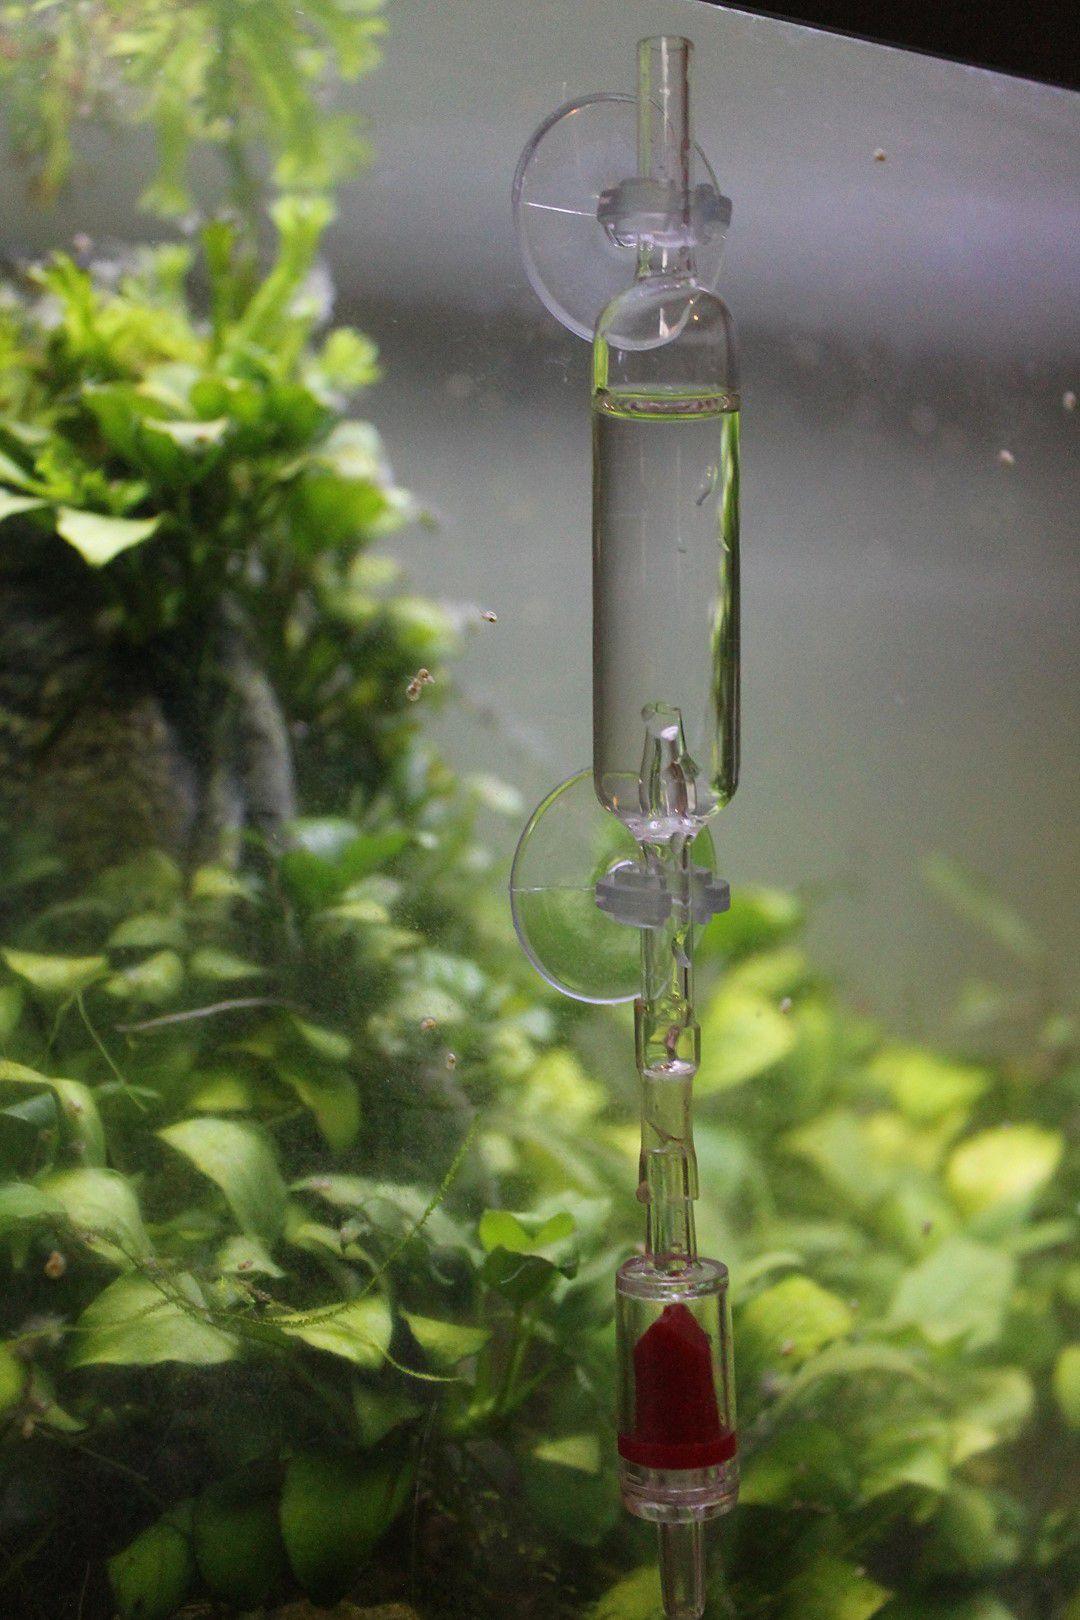 Conta bolhas de vidro